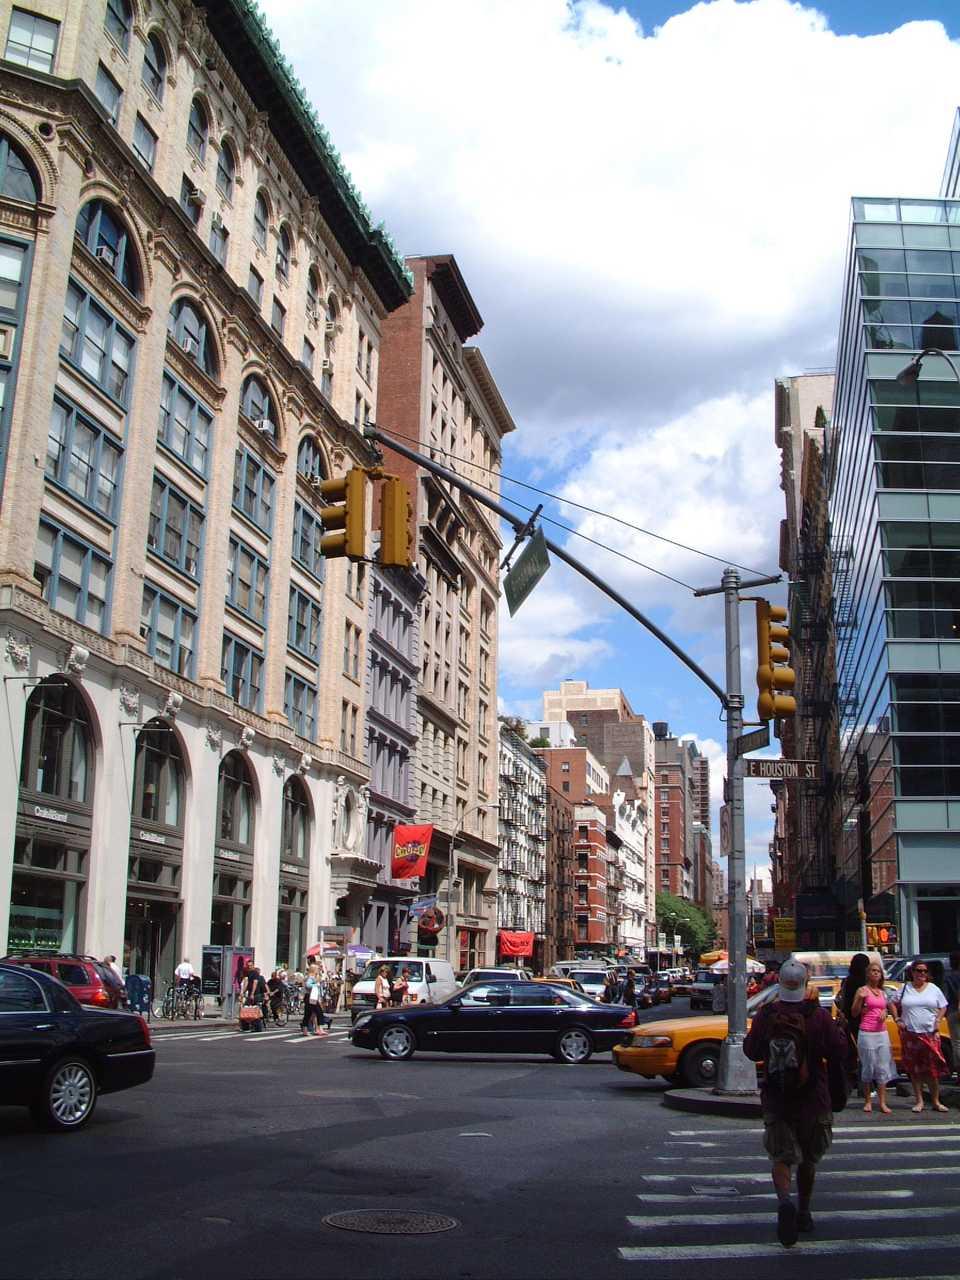 New York, New York: So...